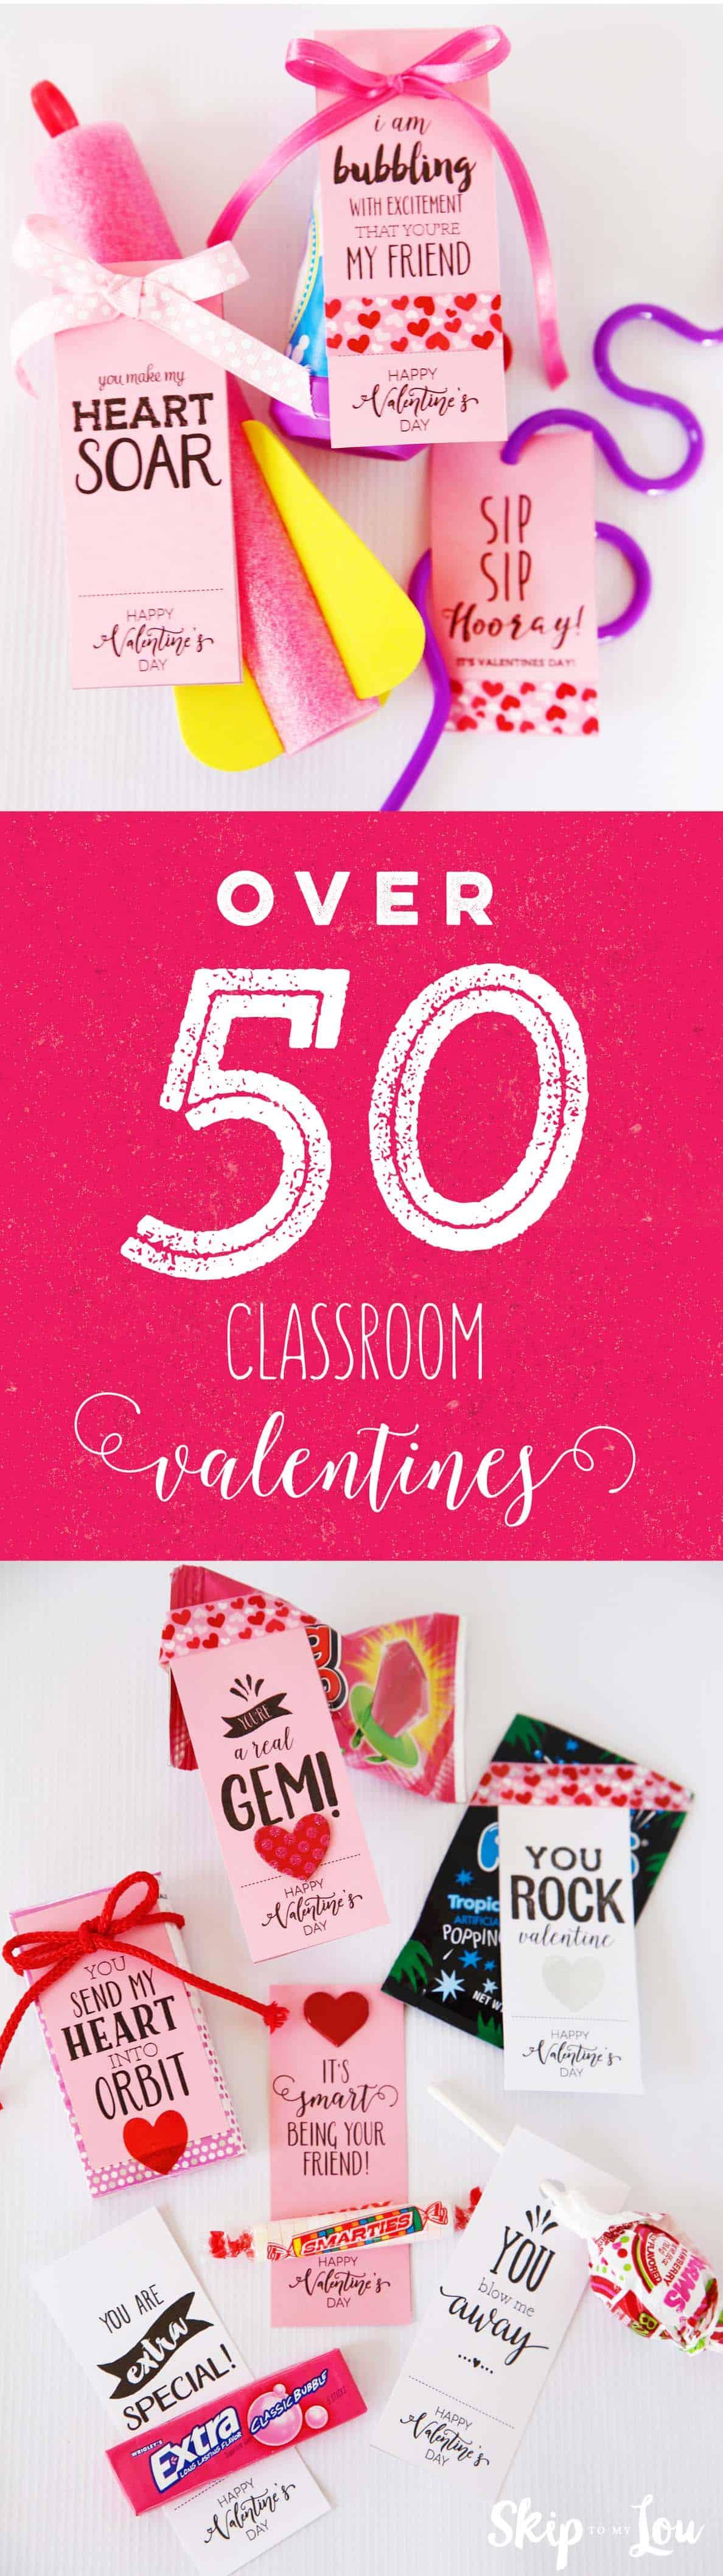 50 classroom valentines